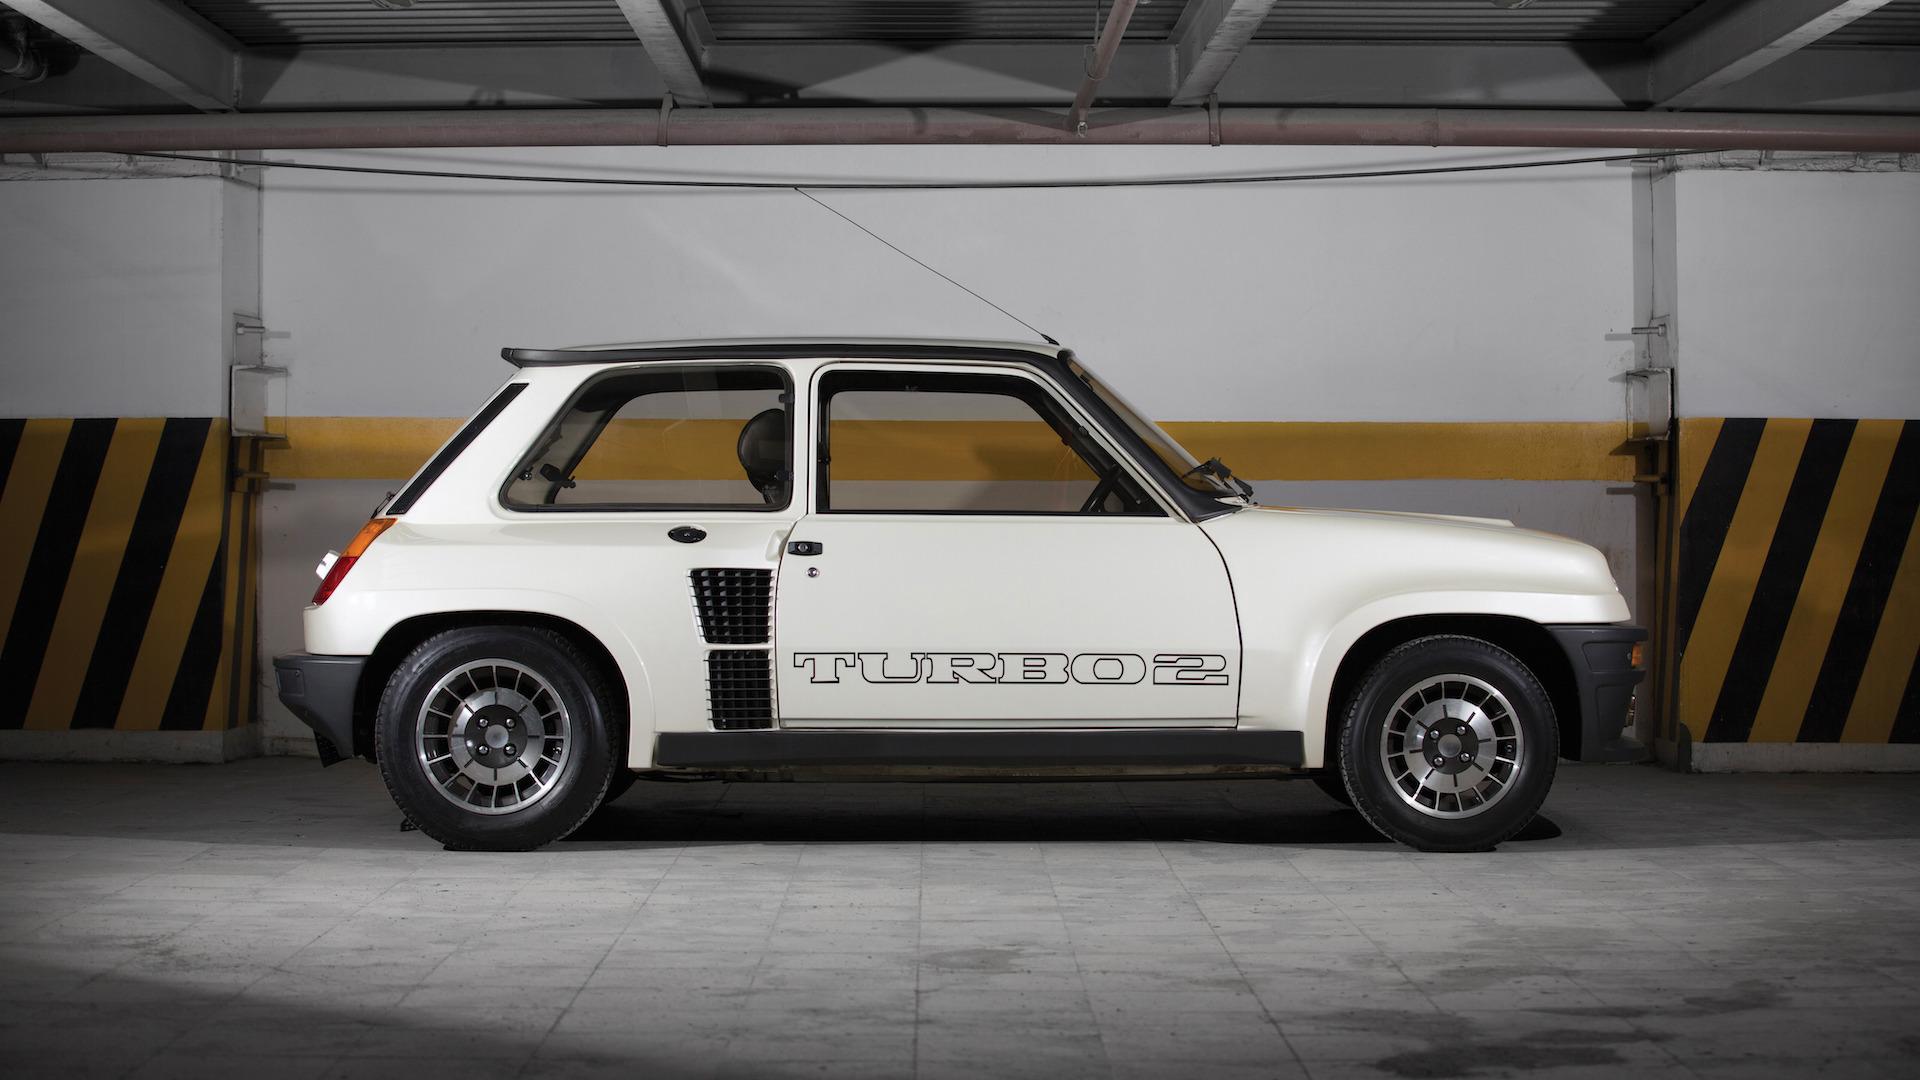 Renault turbo 2